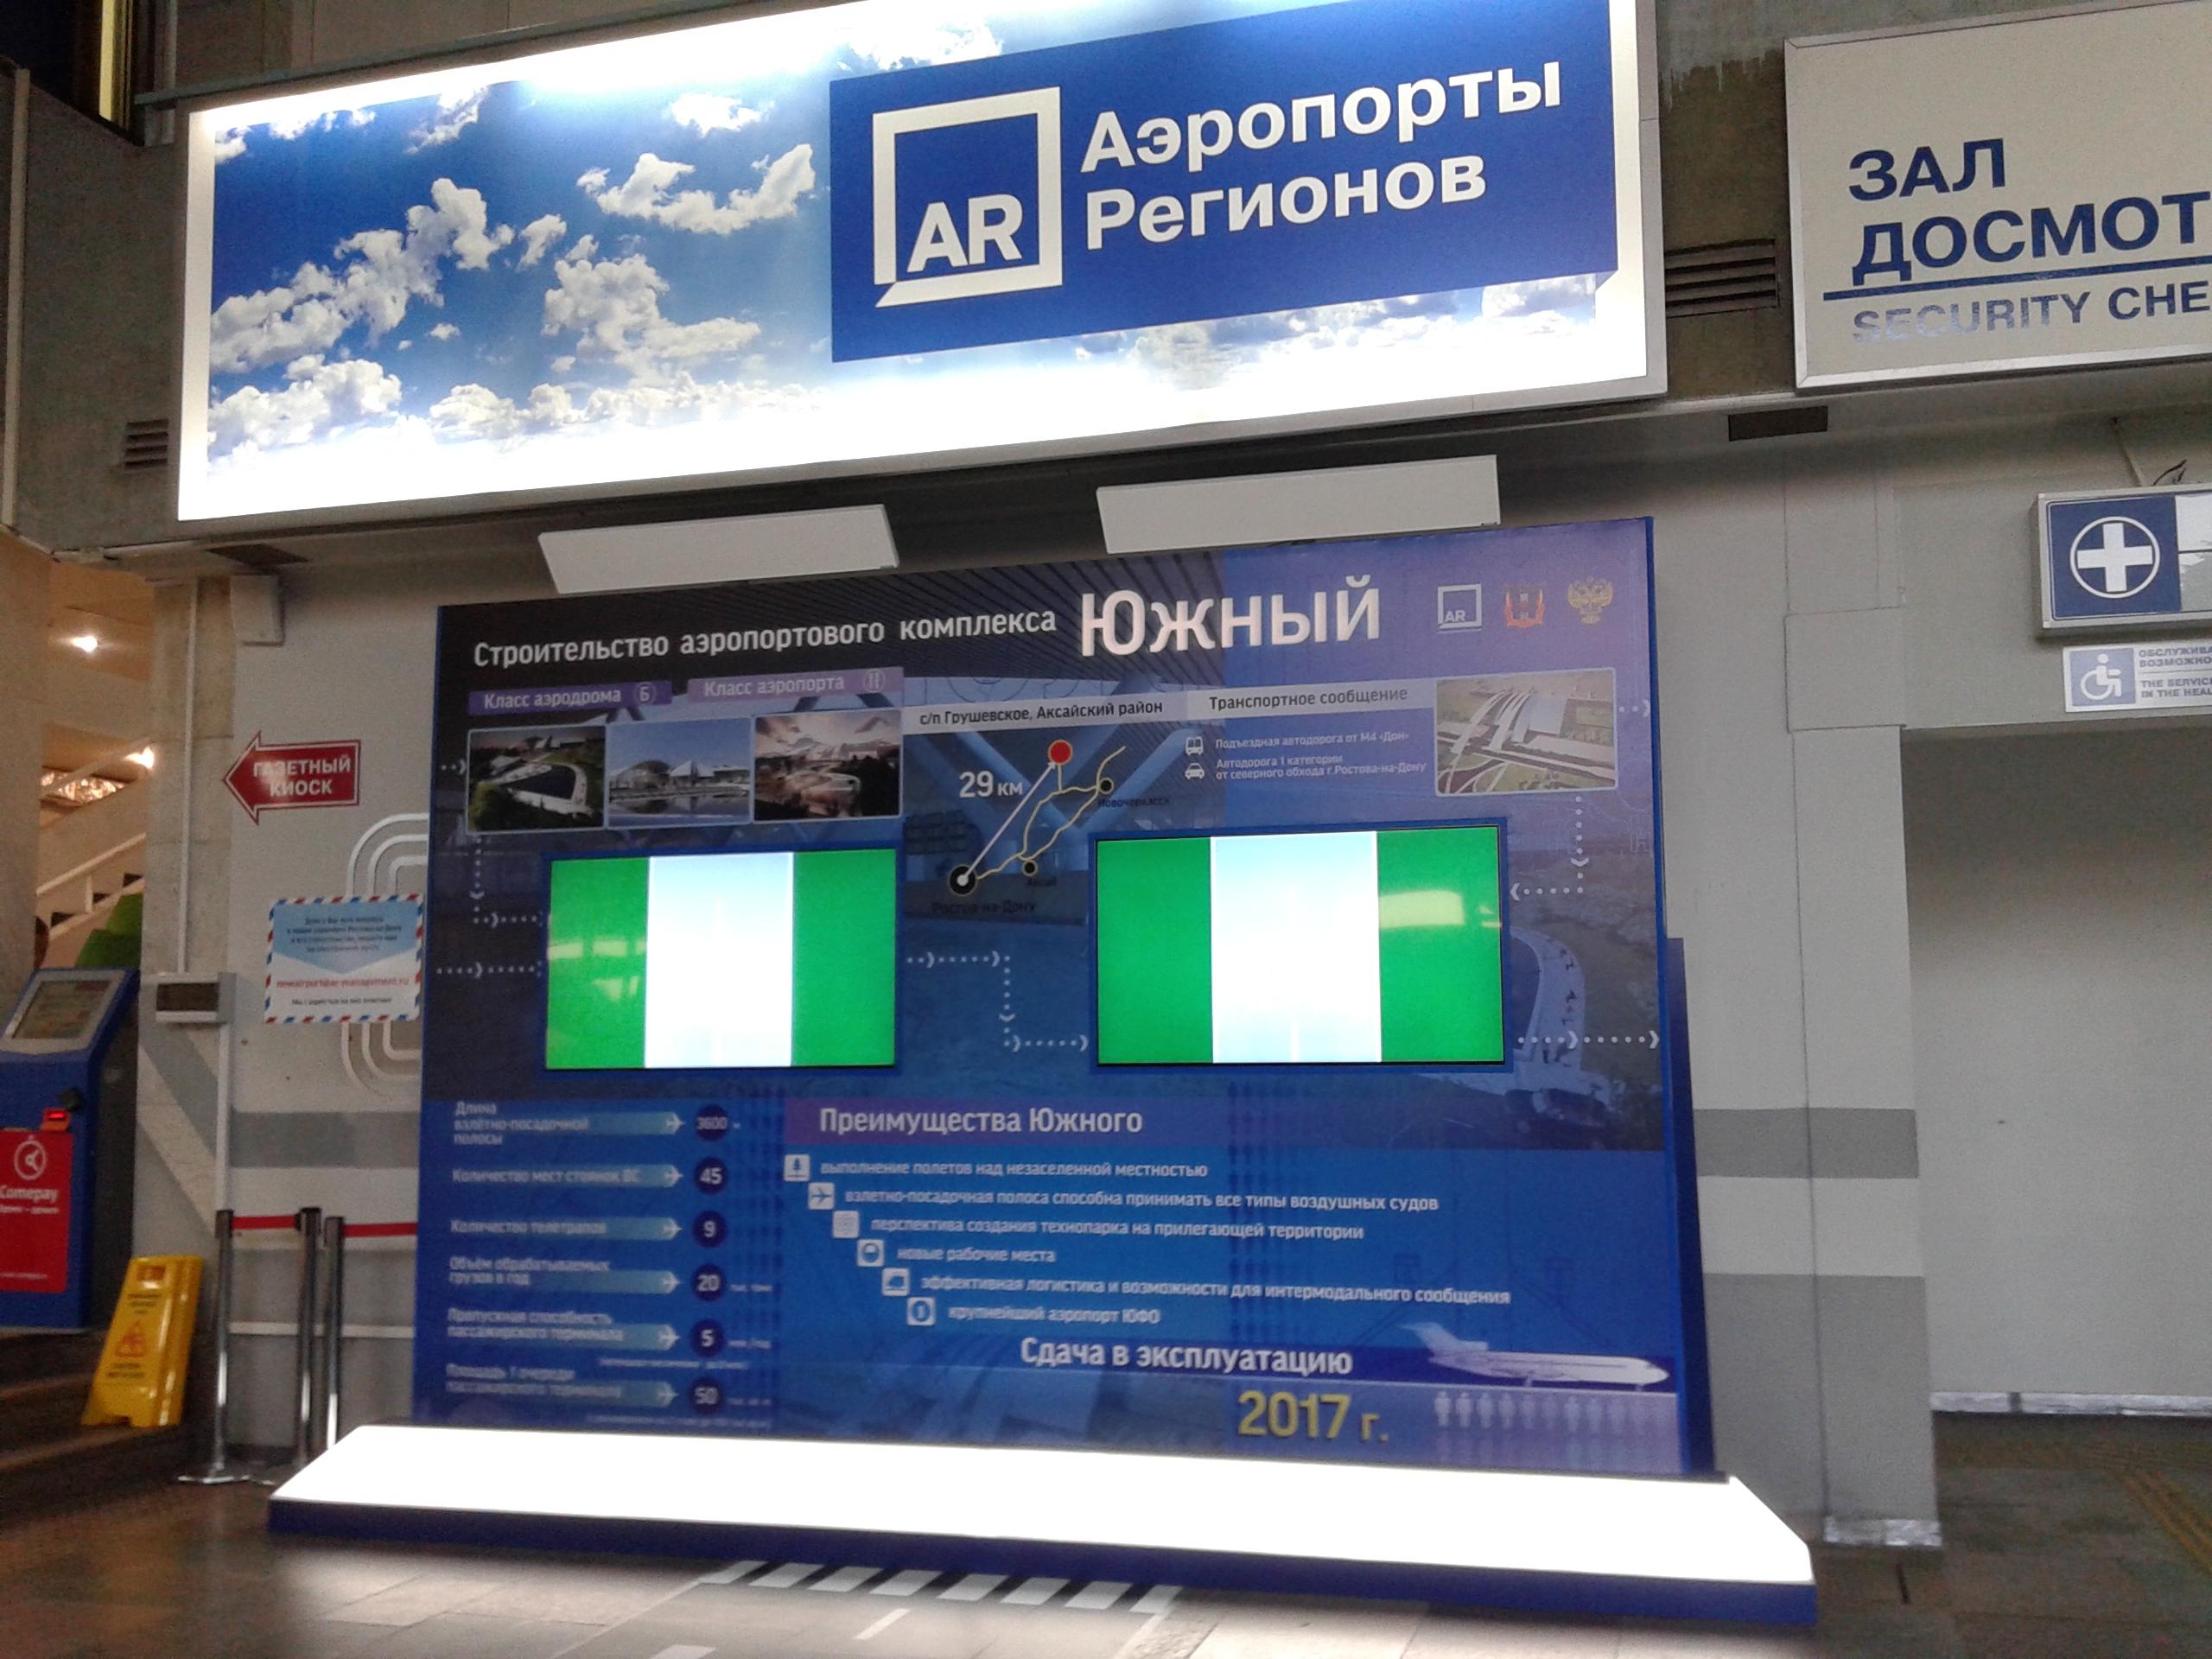 2015-06-30 Стенд аэропорт РнД